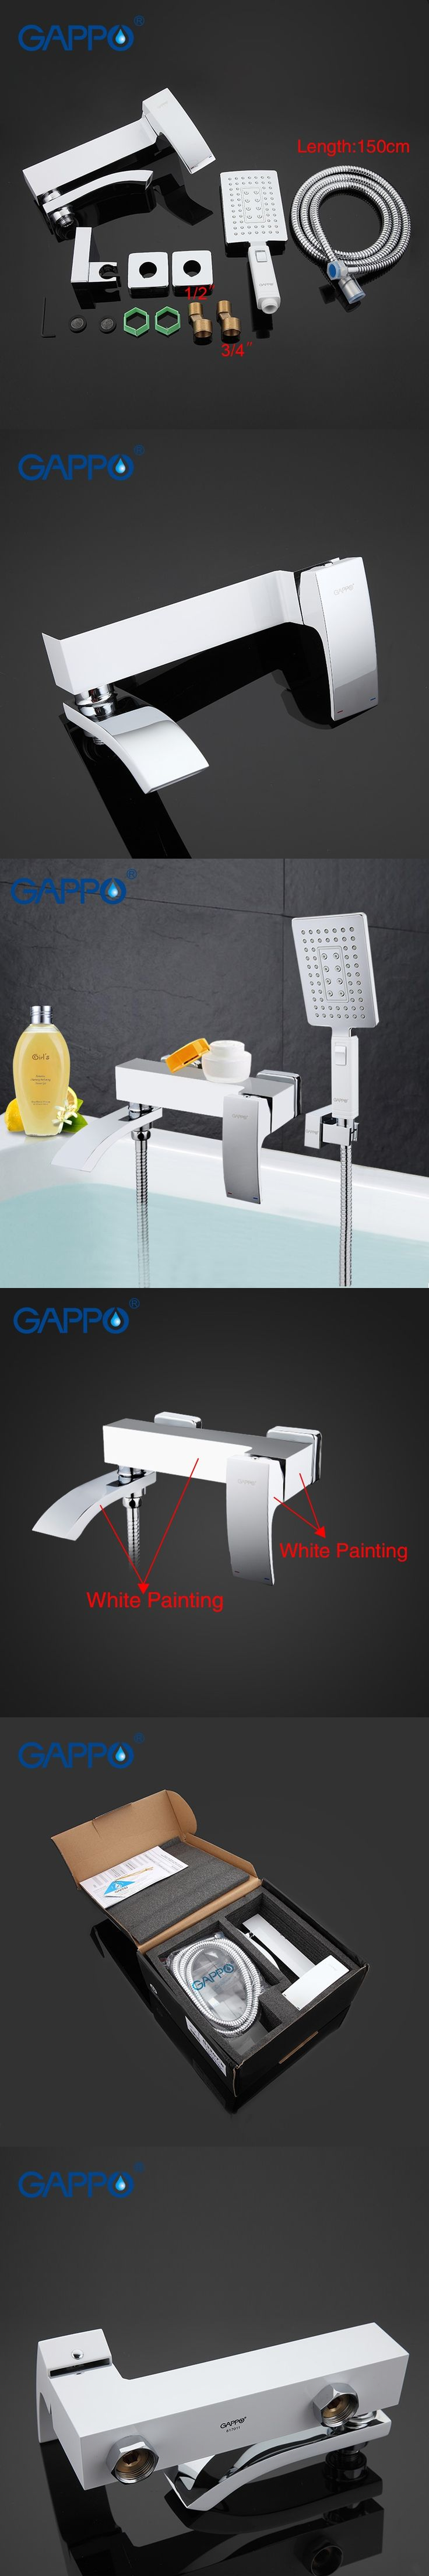 GAPPO Bathtub Faucet bathroom faucet bathroom taps wall mount Brass bathtub mixer bath mixer sink faucet waterfall faucetGA32078